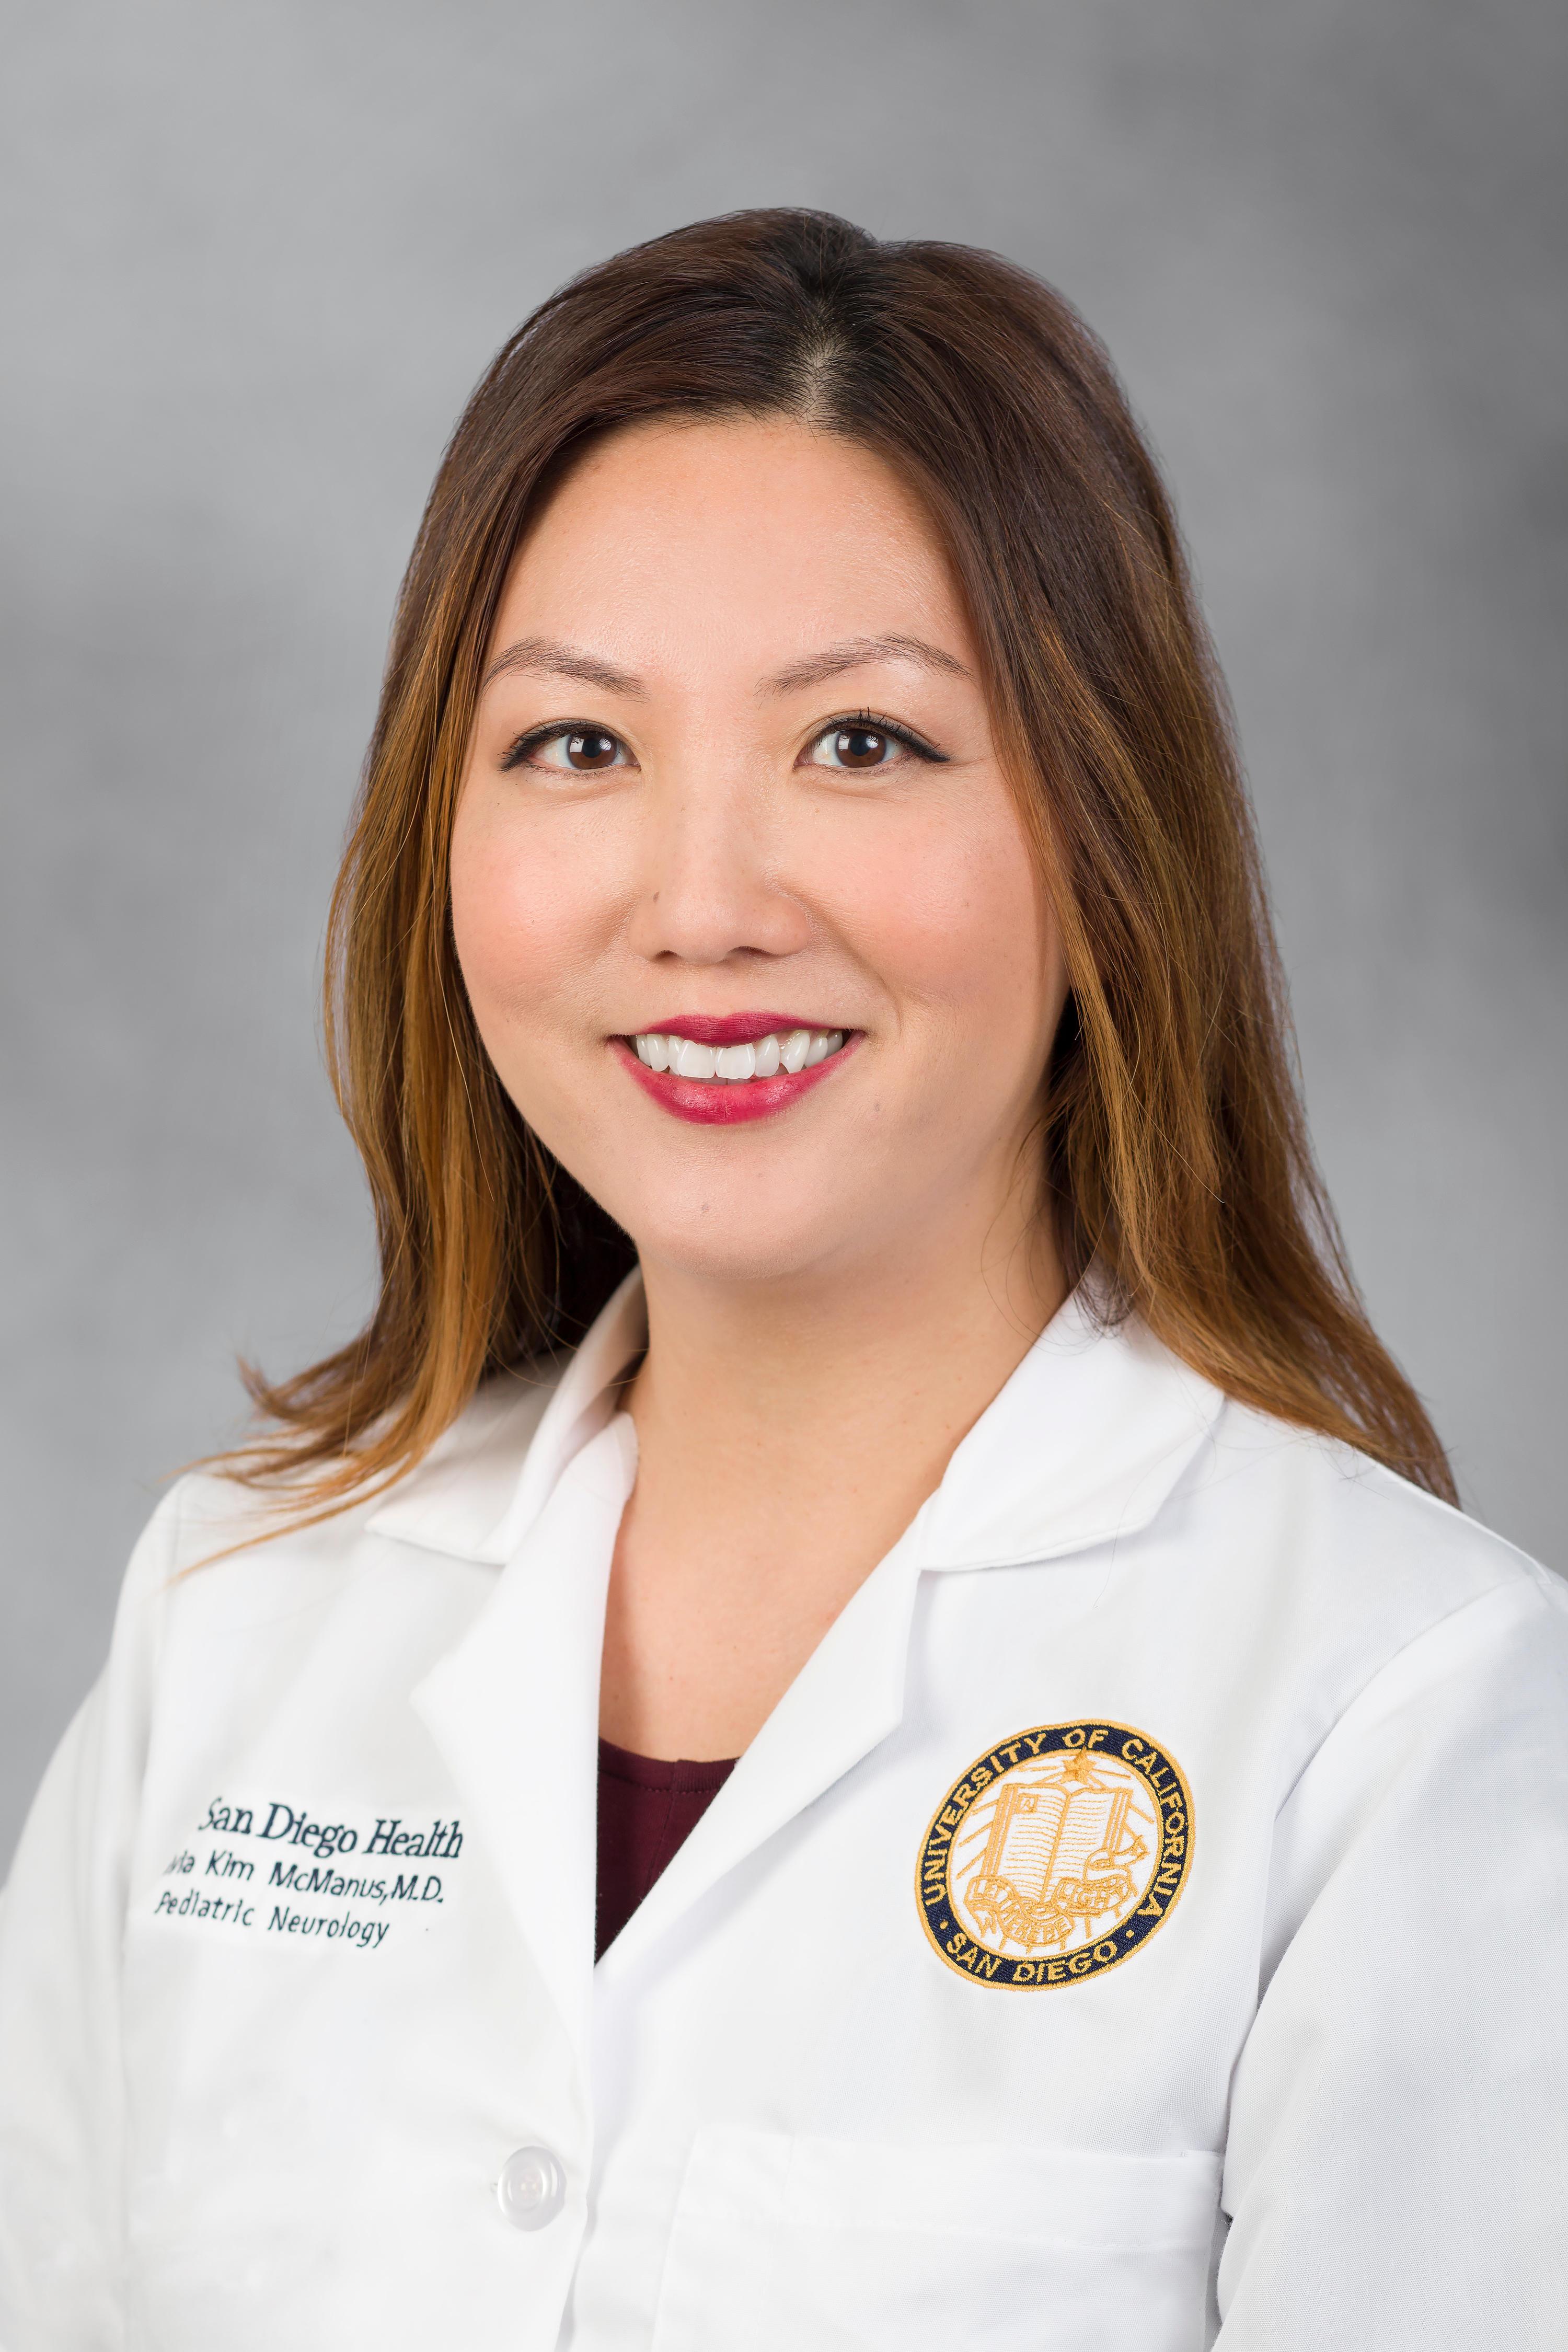 Olivia Kim Mcmanus, MD